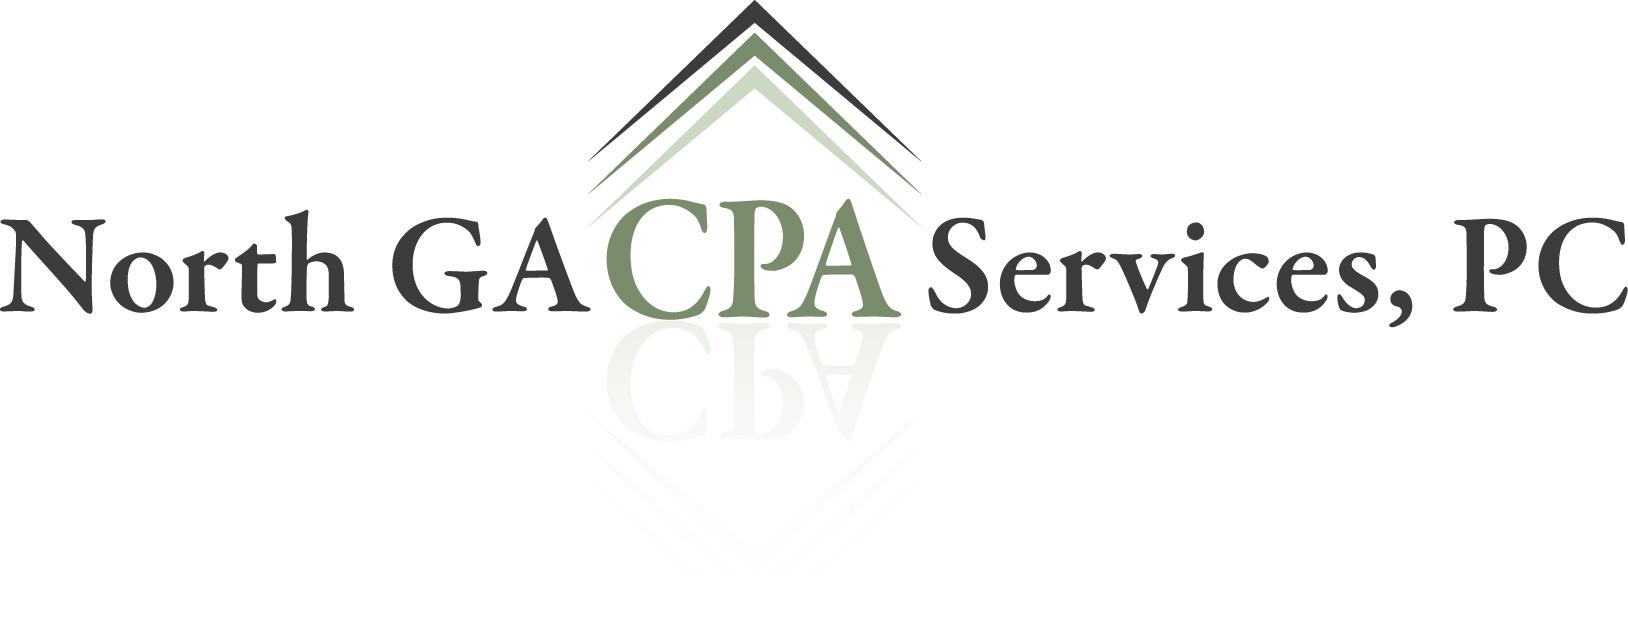 NoGA-CPA_logo 3 chevrons.jpg